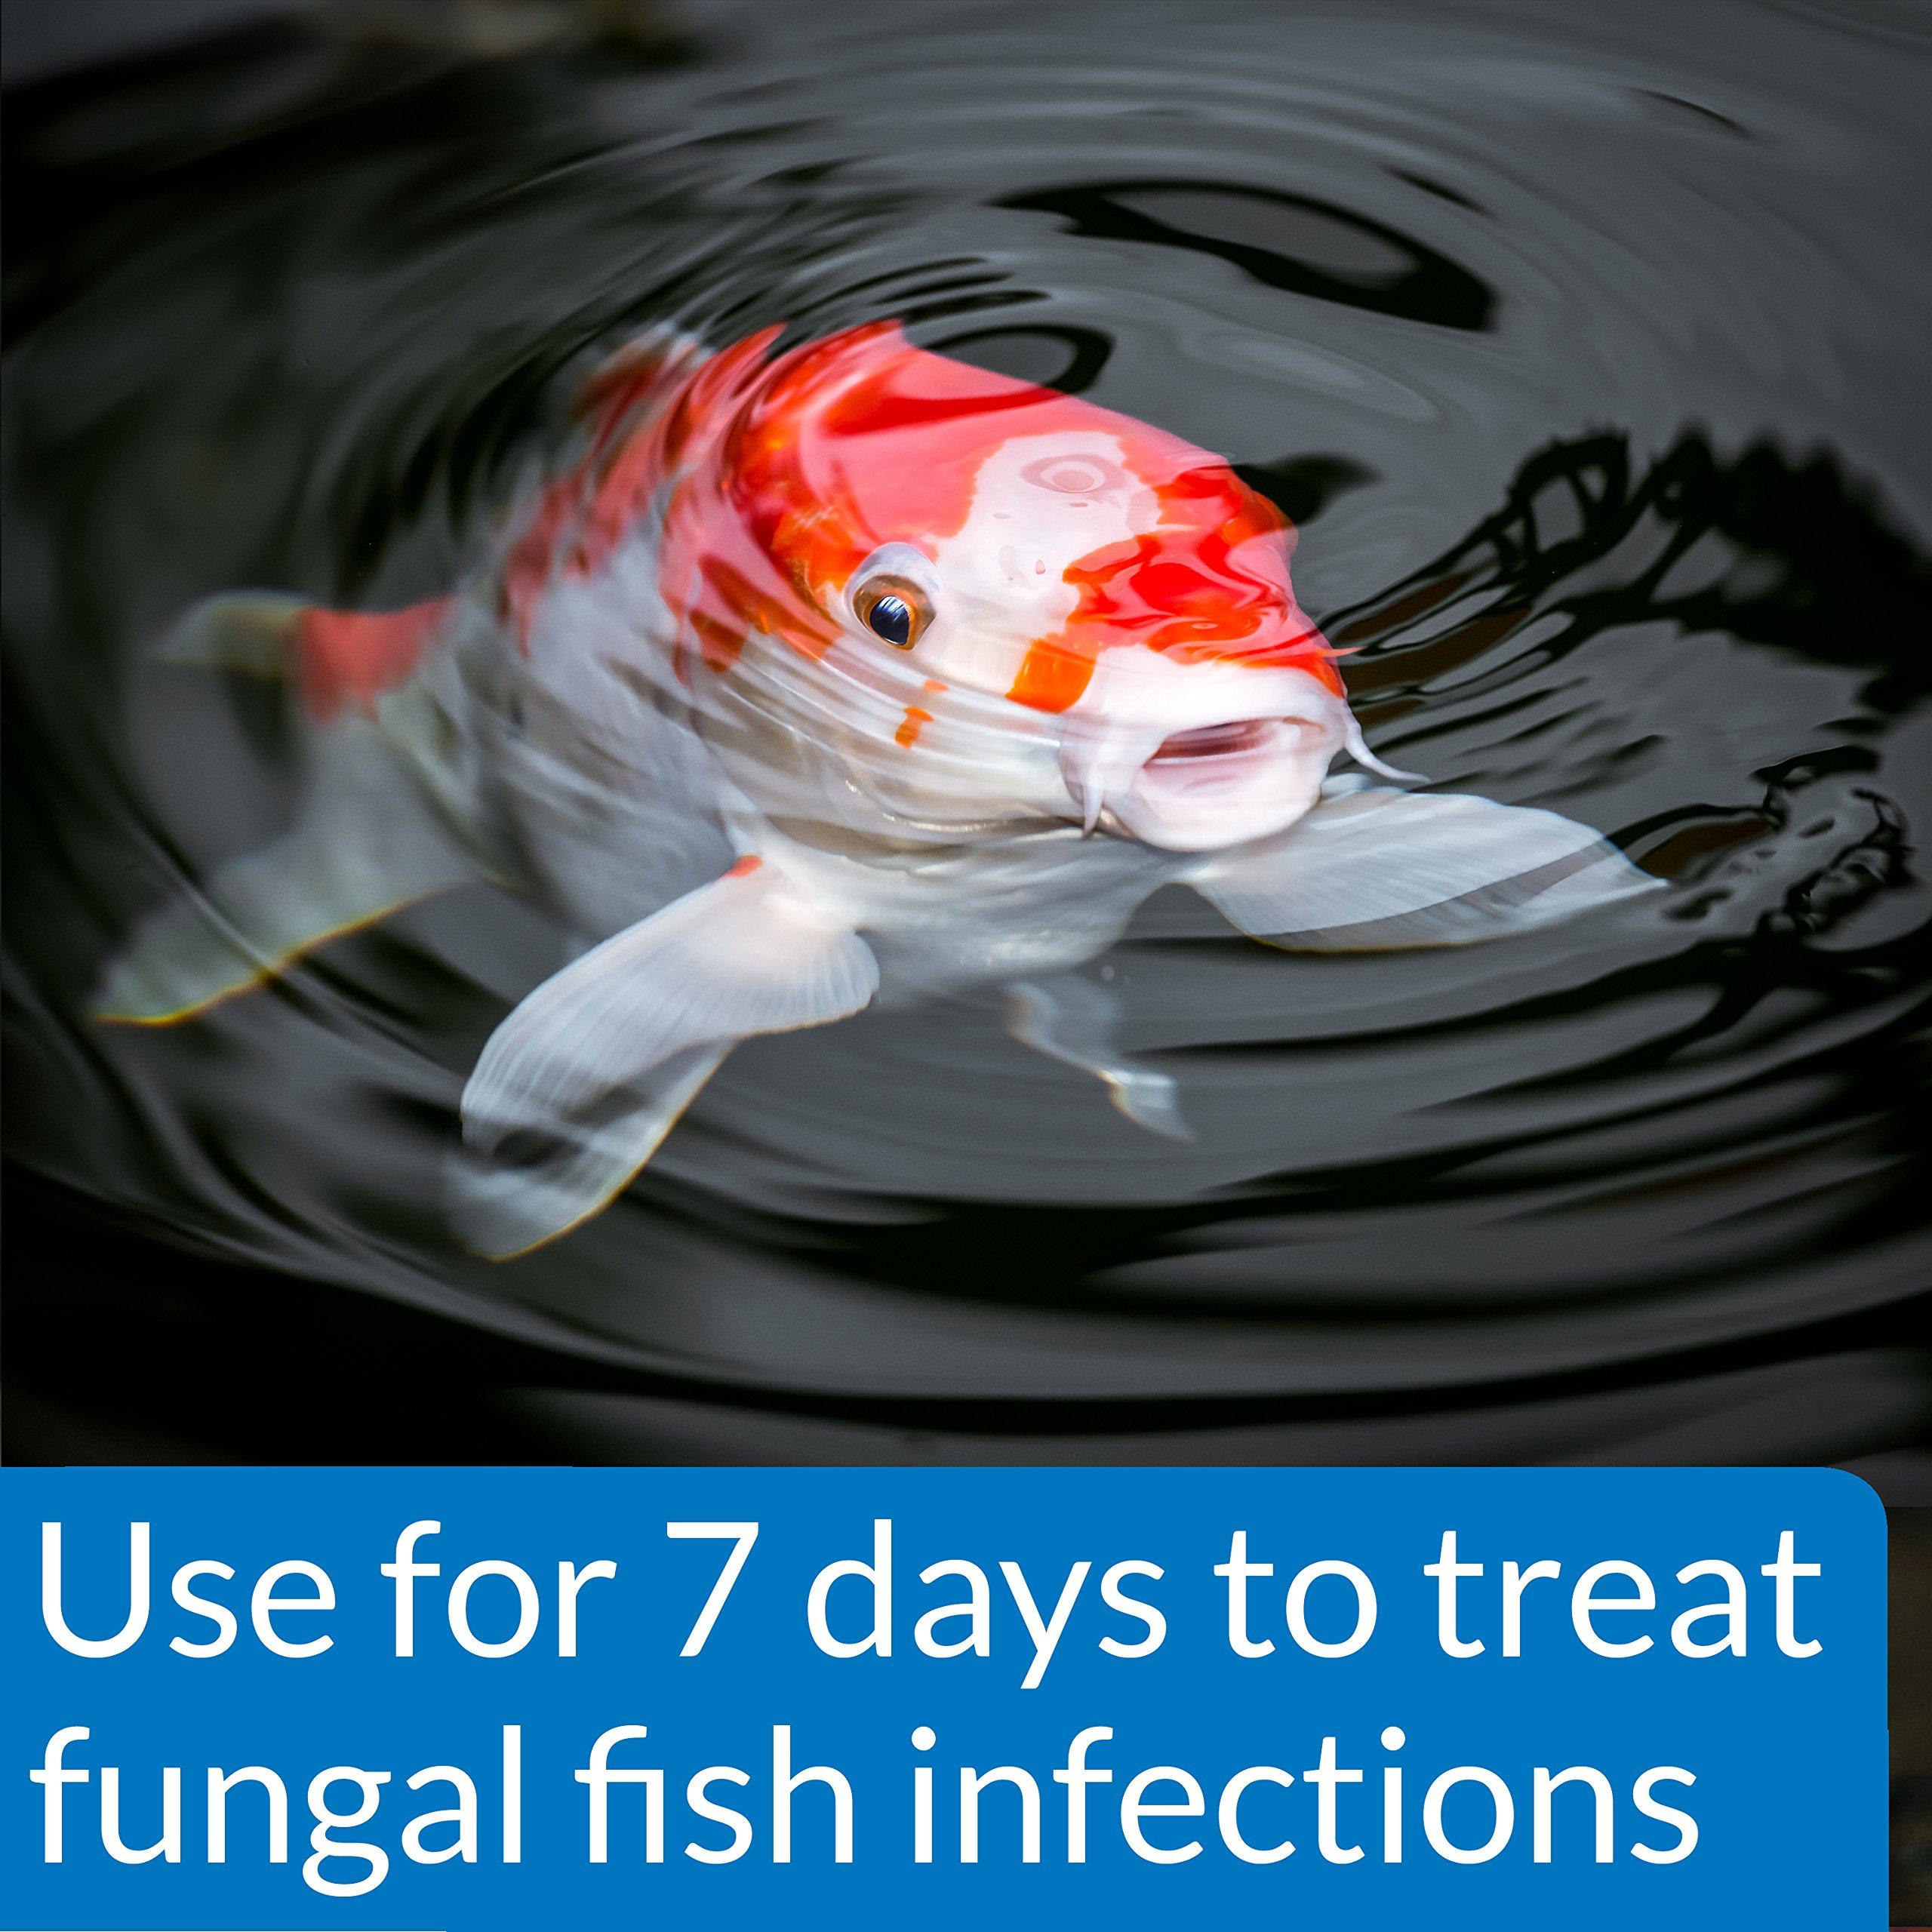 API POND PIMAFIX Antifungal Pond Fish Infection Remedy 64-Ounce Bottle by API (Image #2)